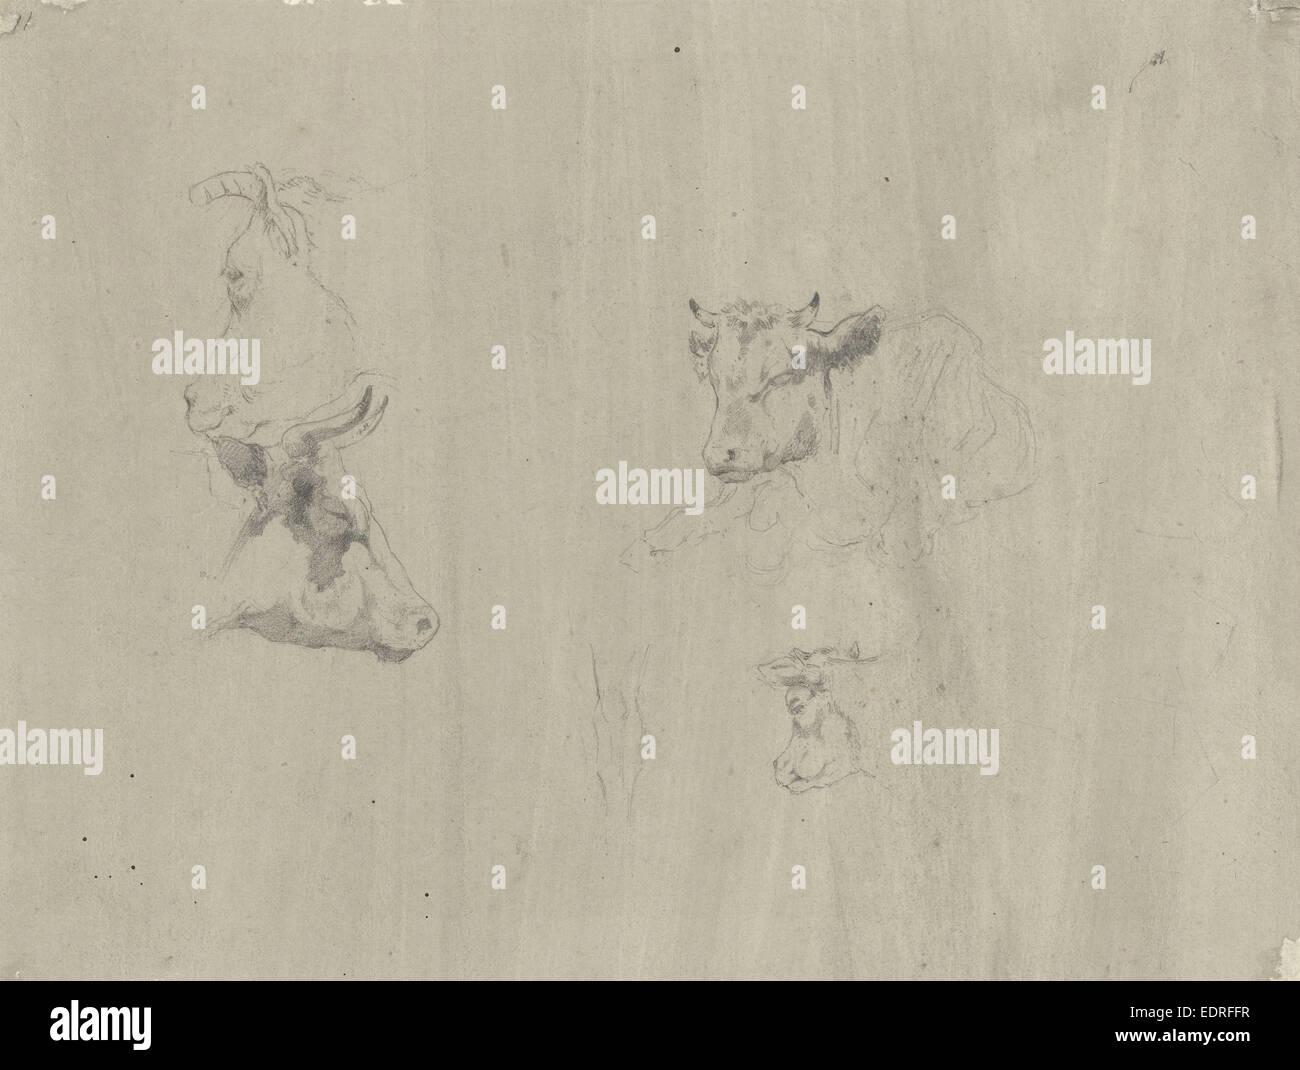 Studi di vacche, Gerard Bilders, 1848 - 1865 Immagini Stock